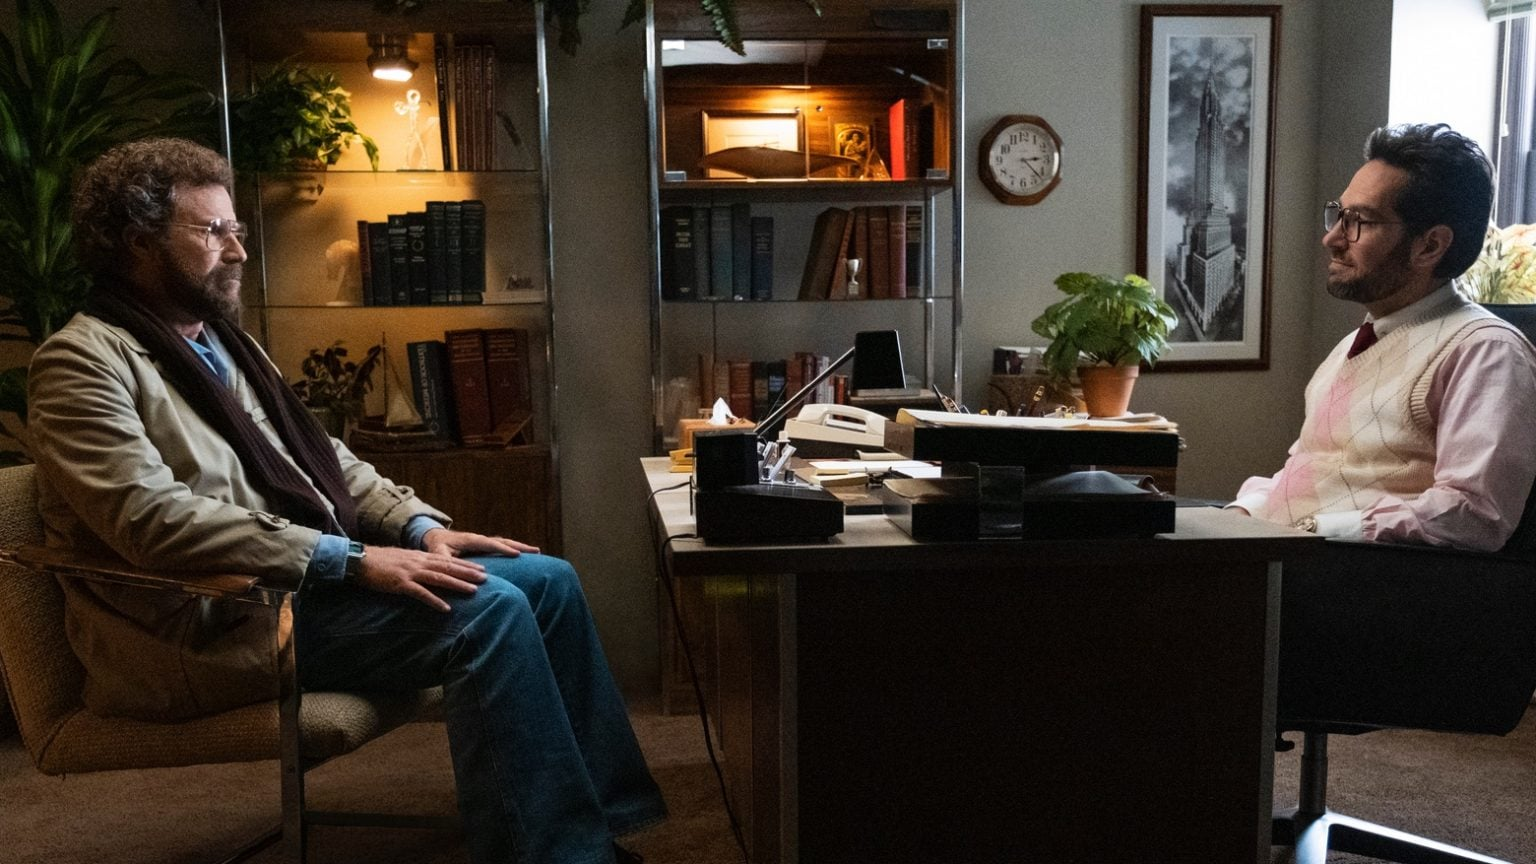 First trailer reveals the dark comedy of Will Ferrell, Paul Rudd in 'The Shrink Next Door'